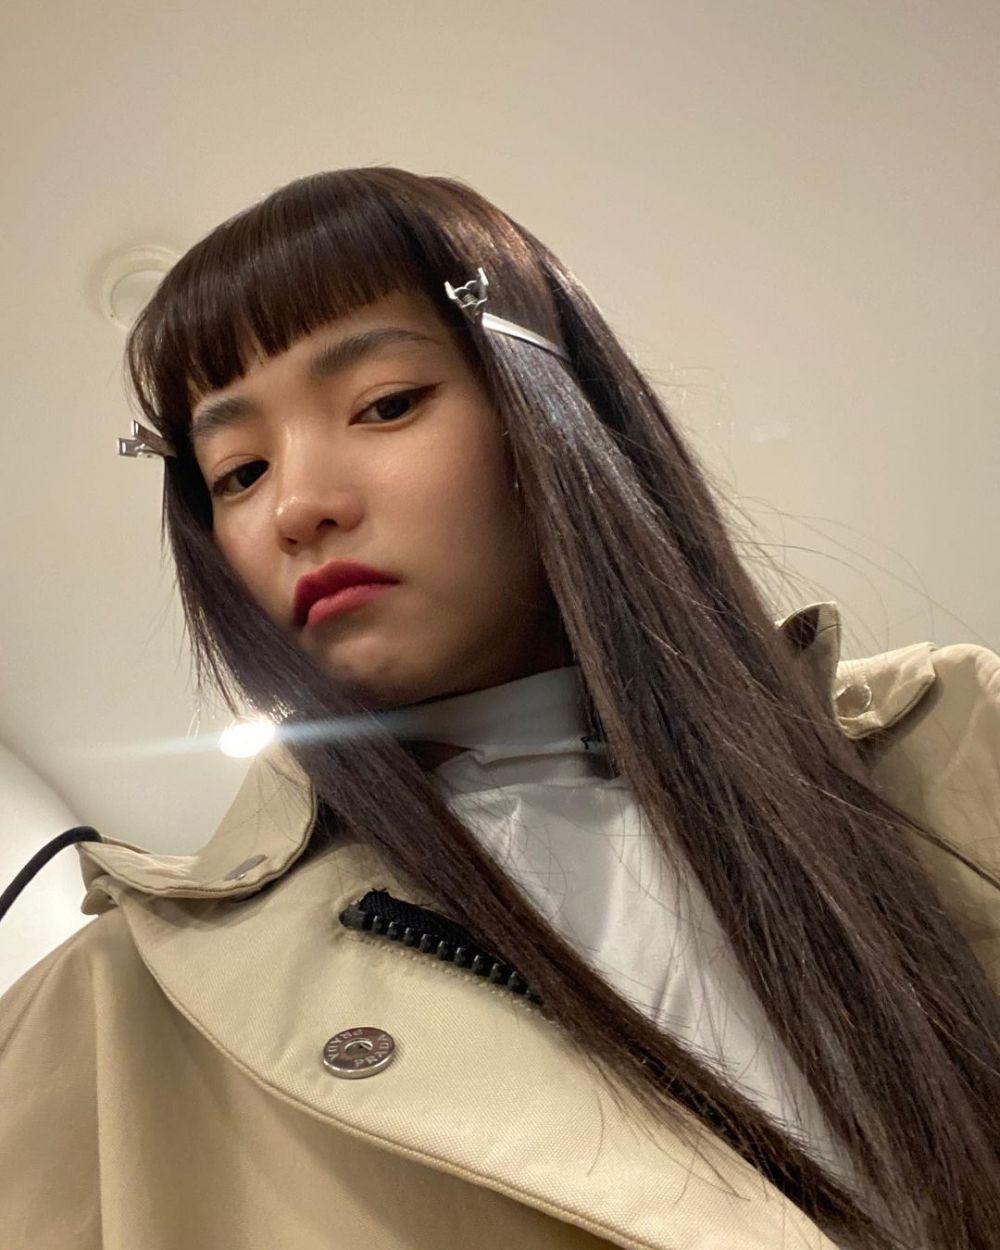 10 Potret Pesona 5 Seleb Korea dengan Gaya Rambut Baby Bangs